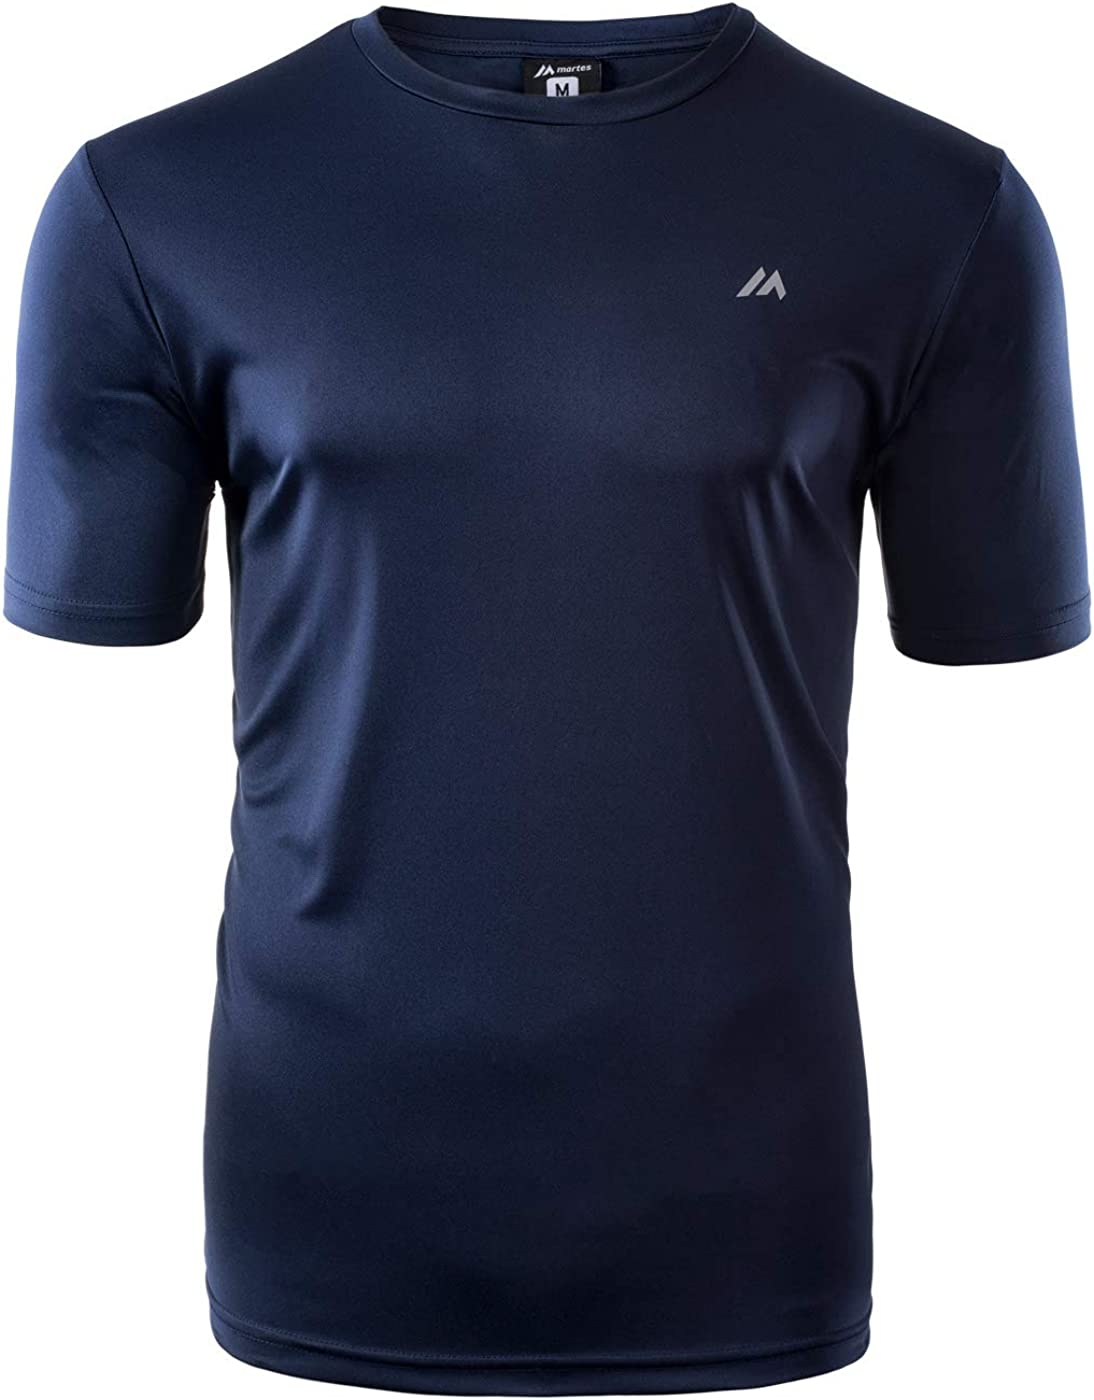 martes Herren Losan Funktions T-Shirt